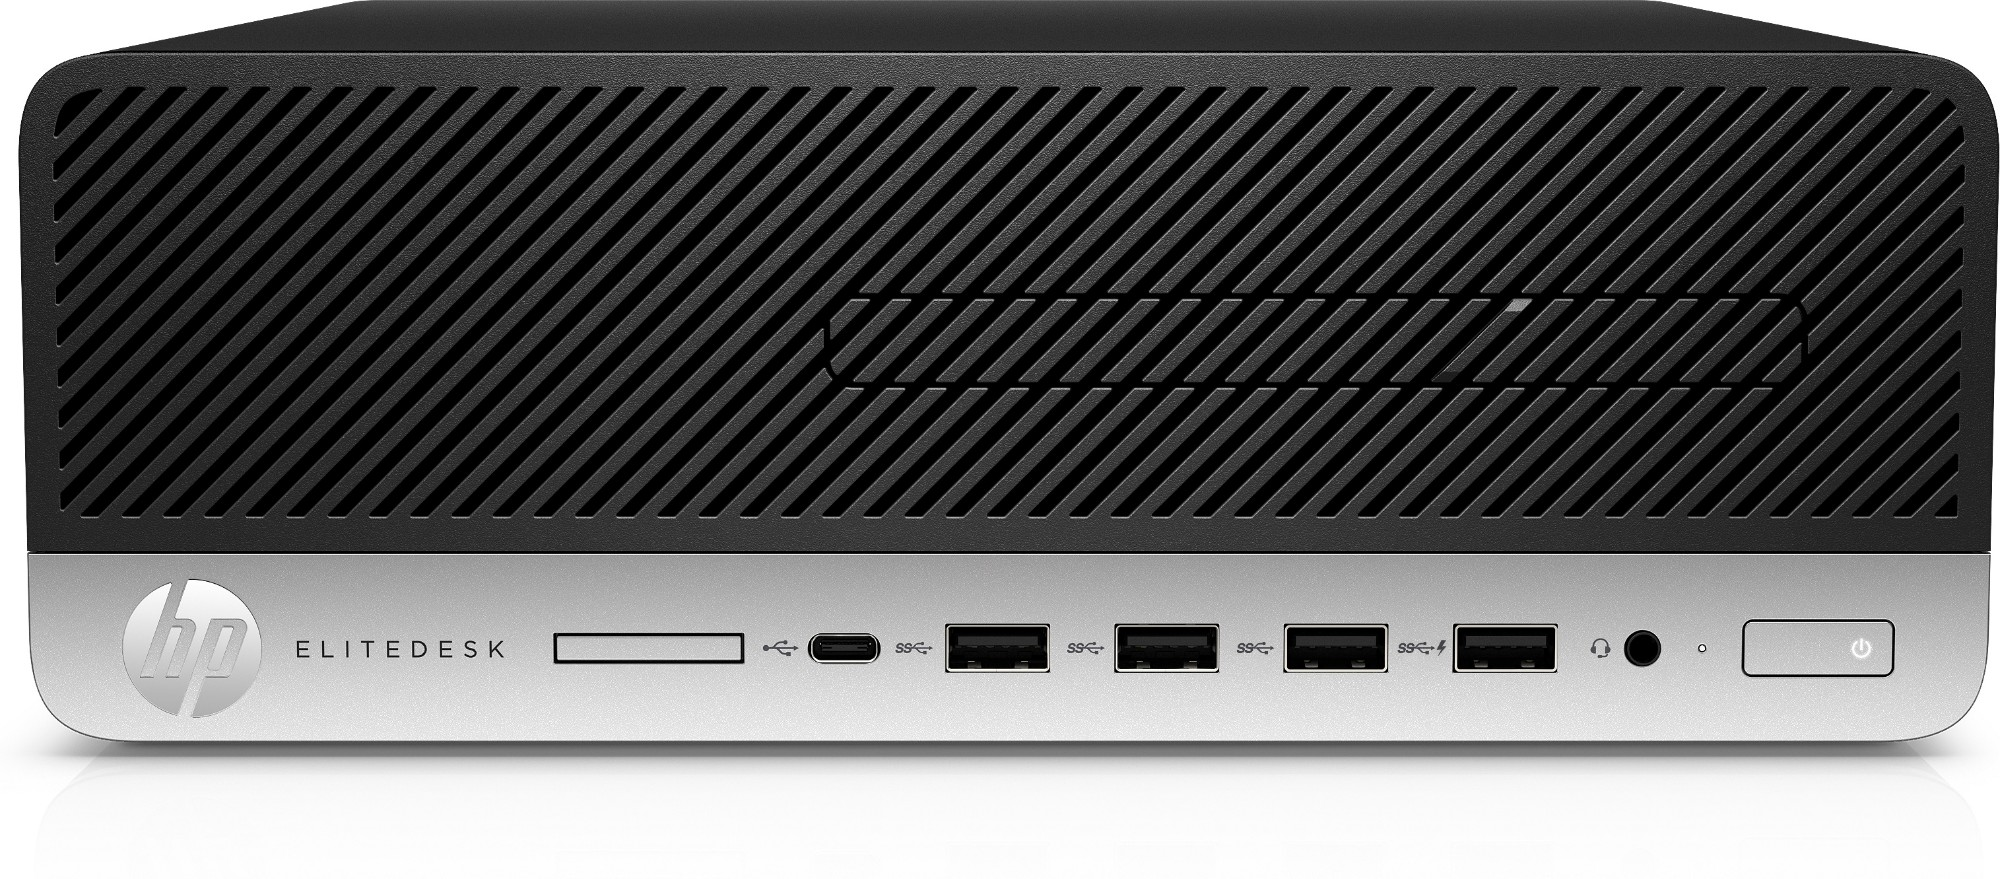 HP EliteDesk Ordinateur à faible encombrement 705 G5 AMD Ryzen 5 PRO 3400G 8 GB DDR4-SDRAM 256 GB SSD SFF Negro, Plata PC Windows 10 Pro